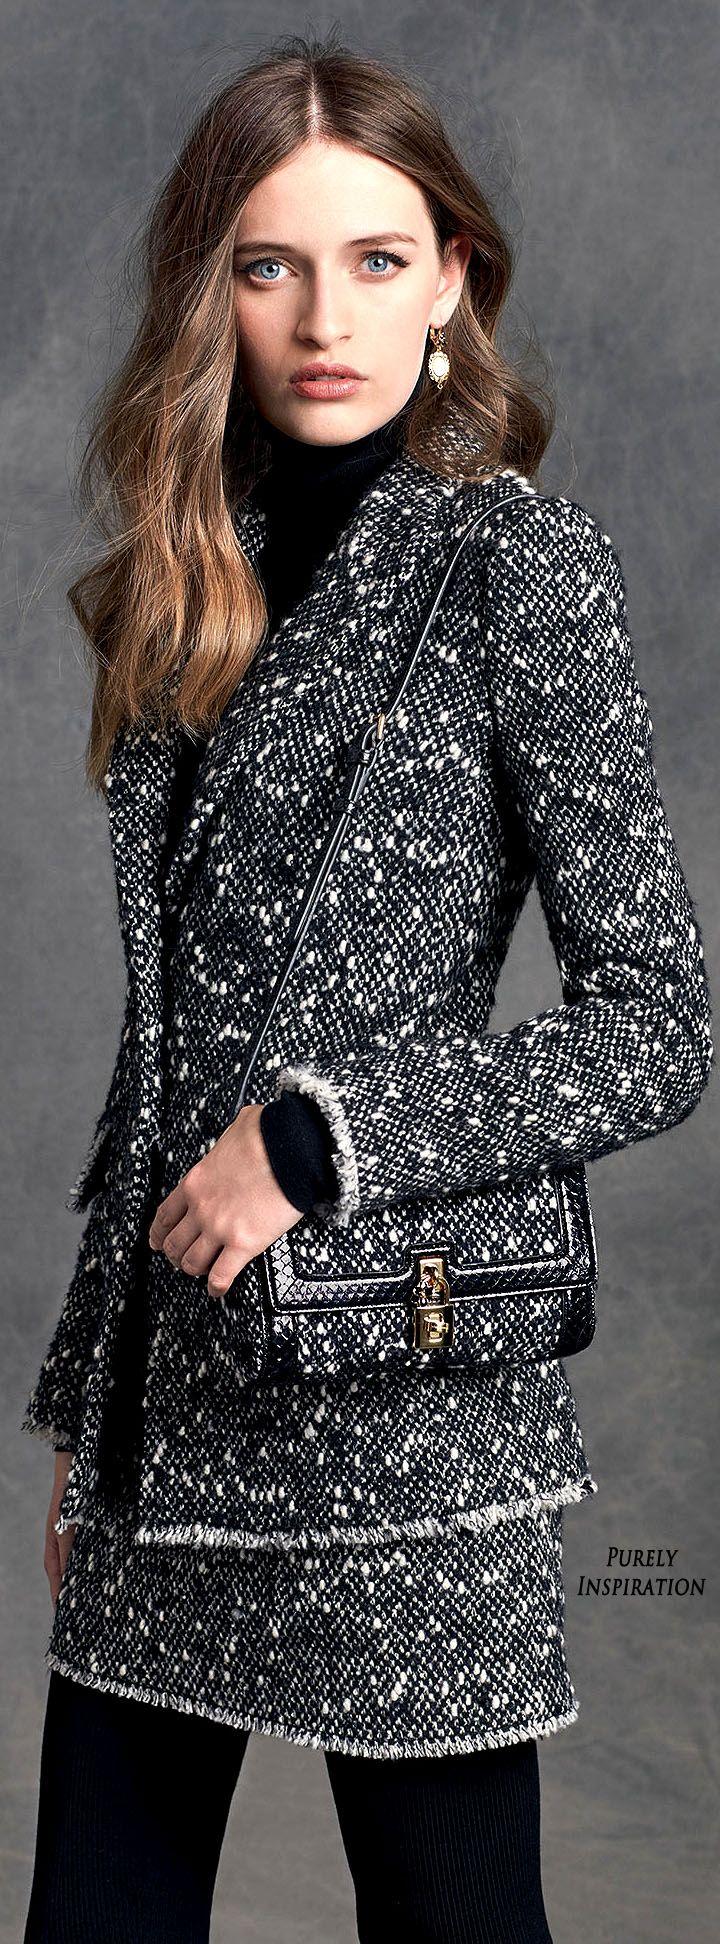 Dolce & Gabbana.        Winter 2016.         Collection.         Women's Fashion.         Ready To Wear.